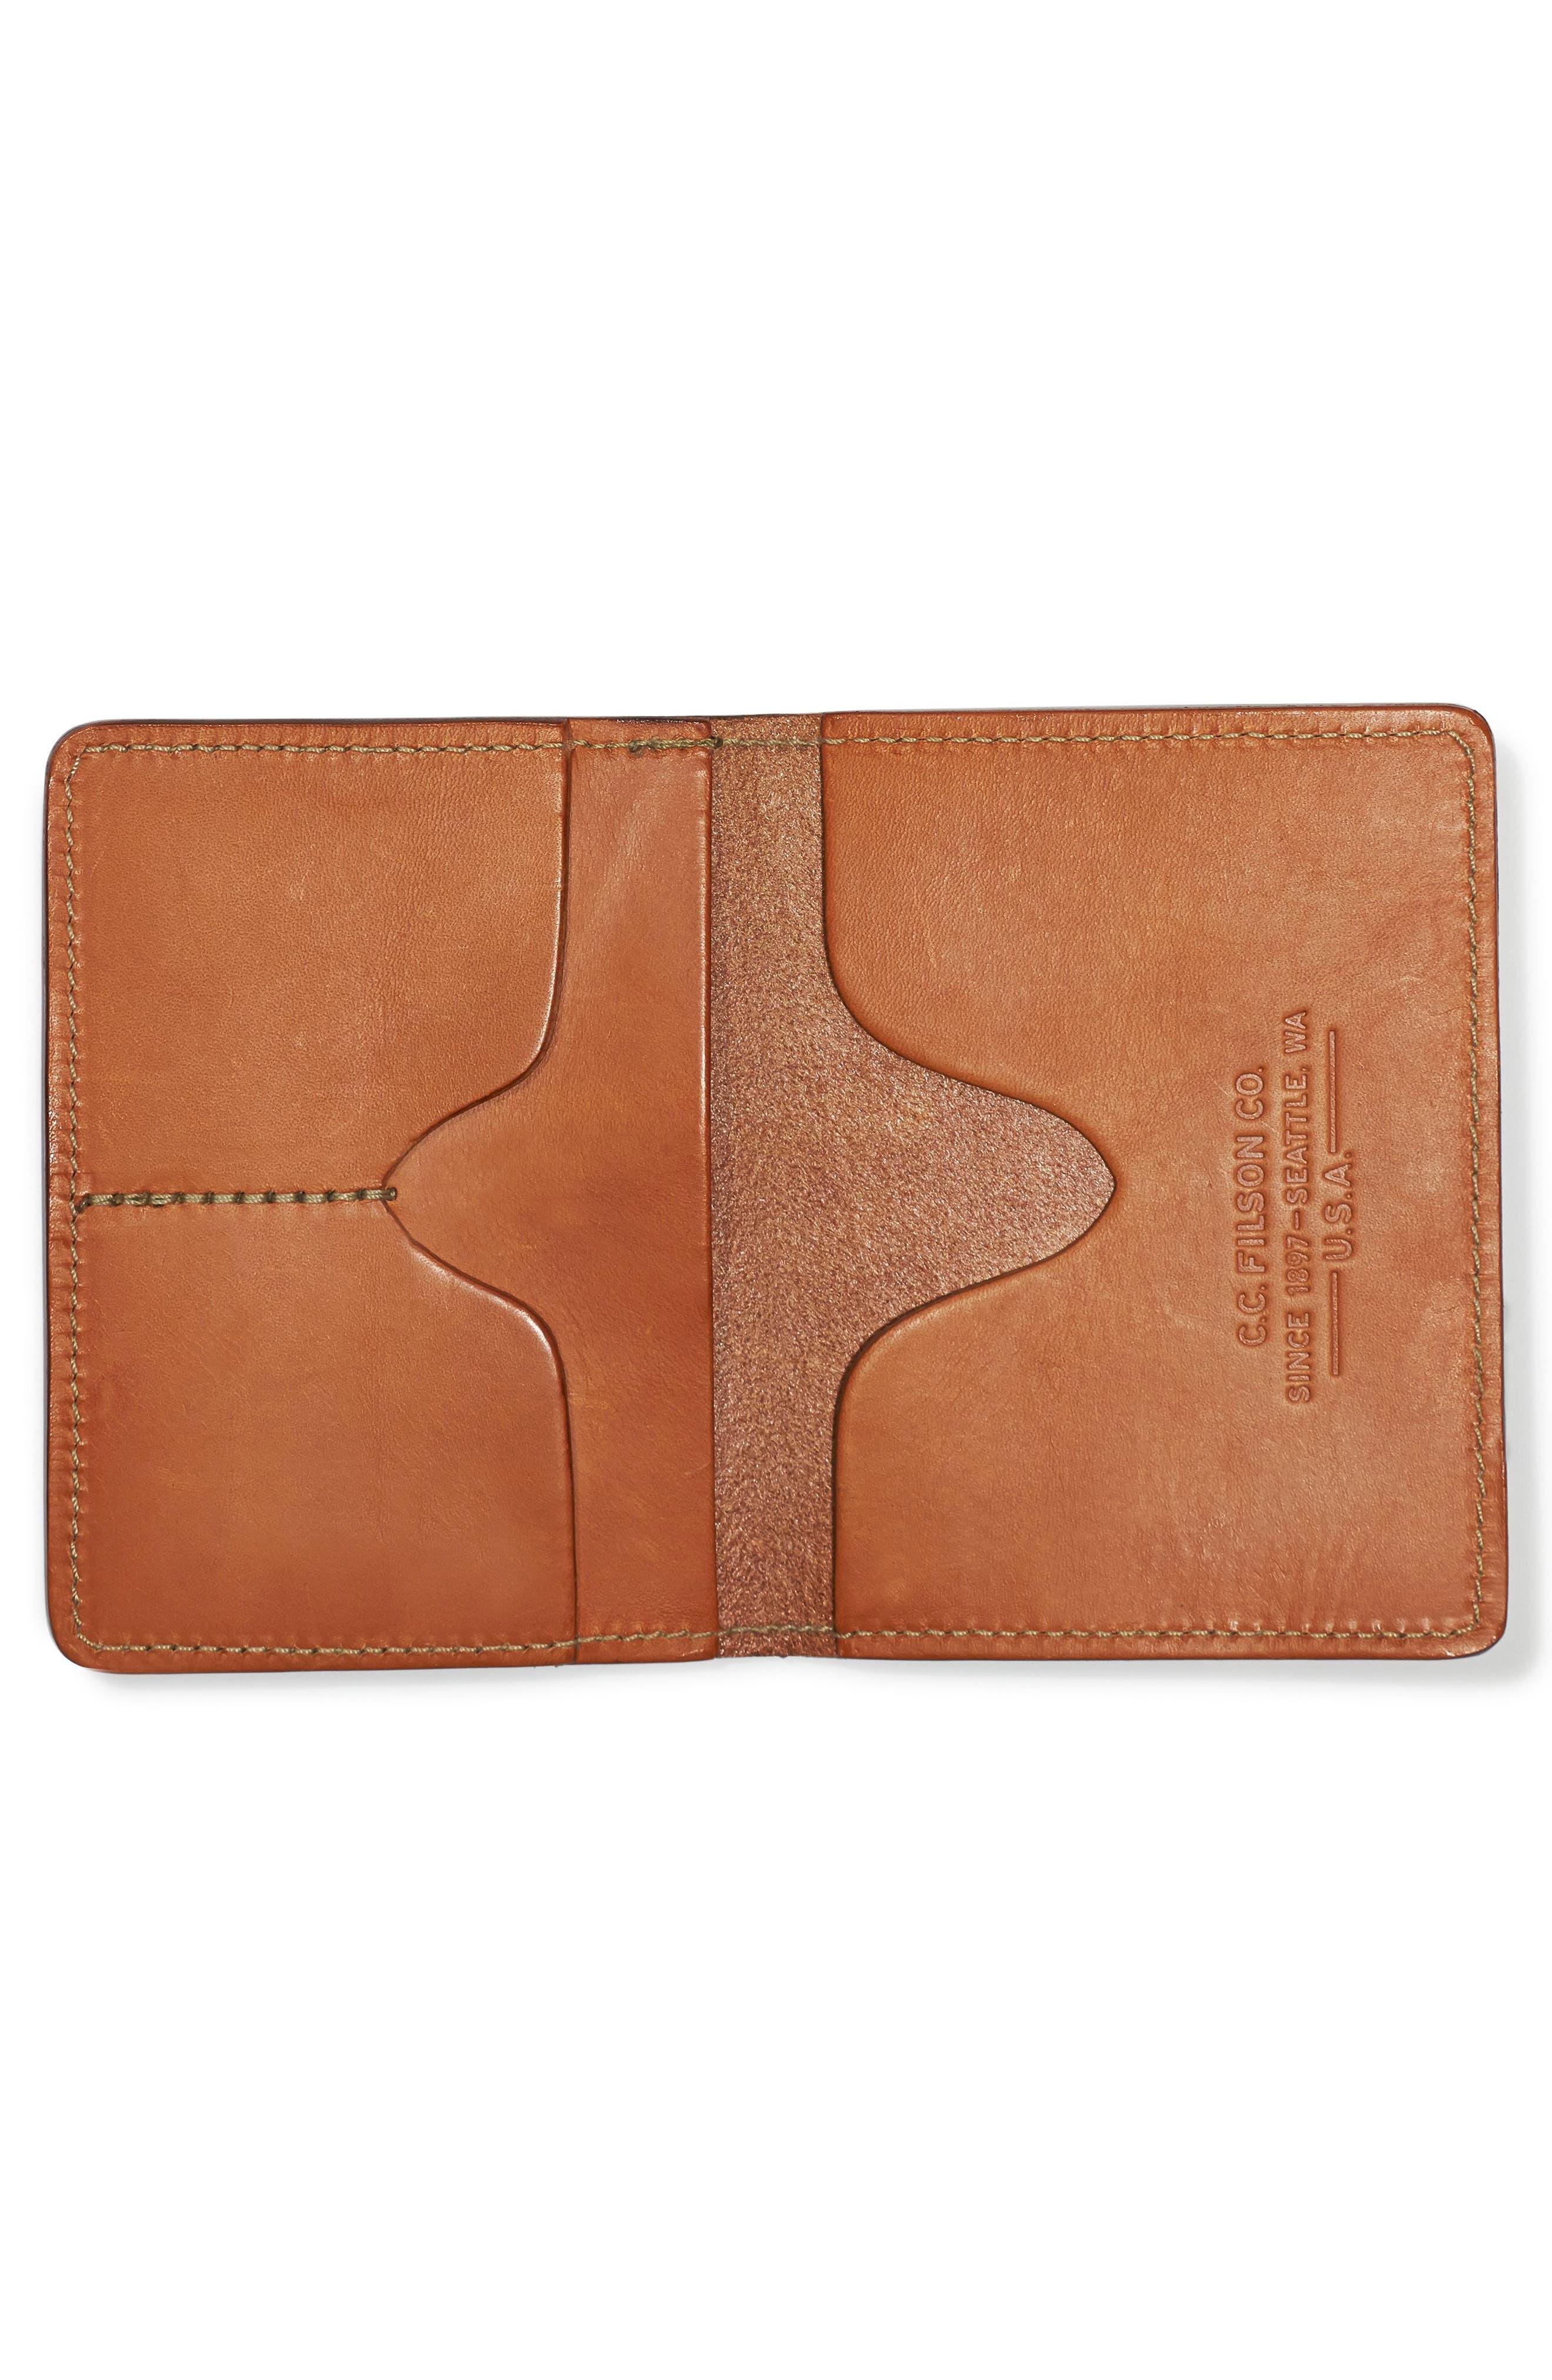 Alternate Image 2  - Filson Leather Passport Case